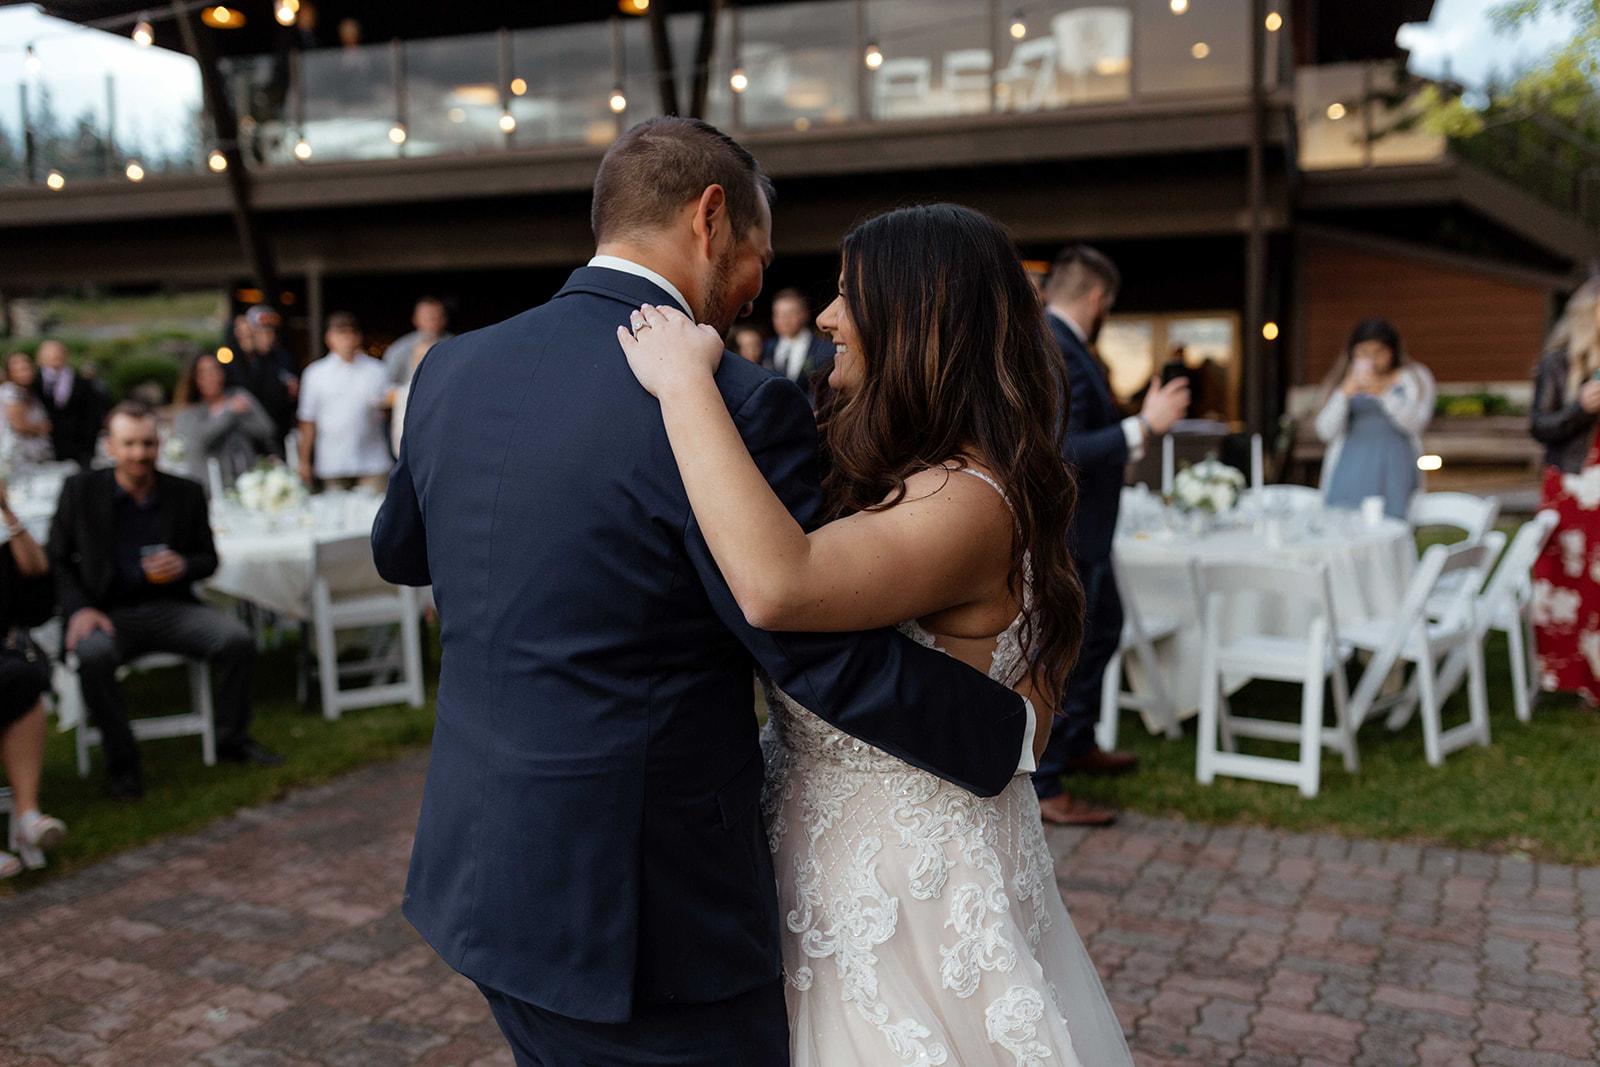 beacon hill wedding honest in ivory dress spokane dancing